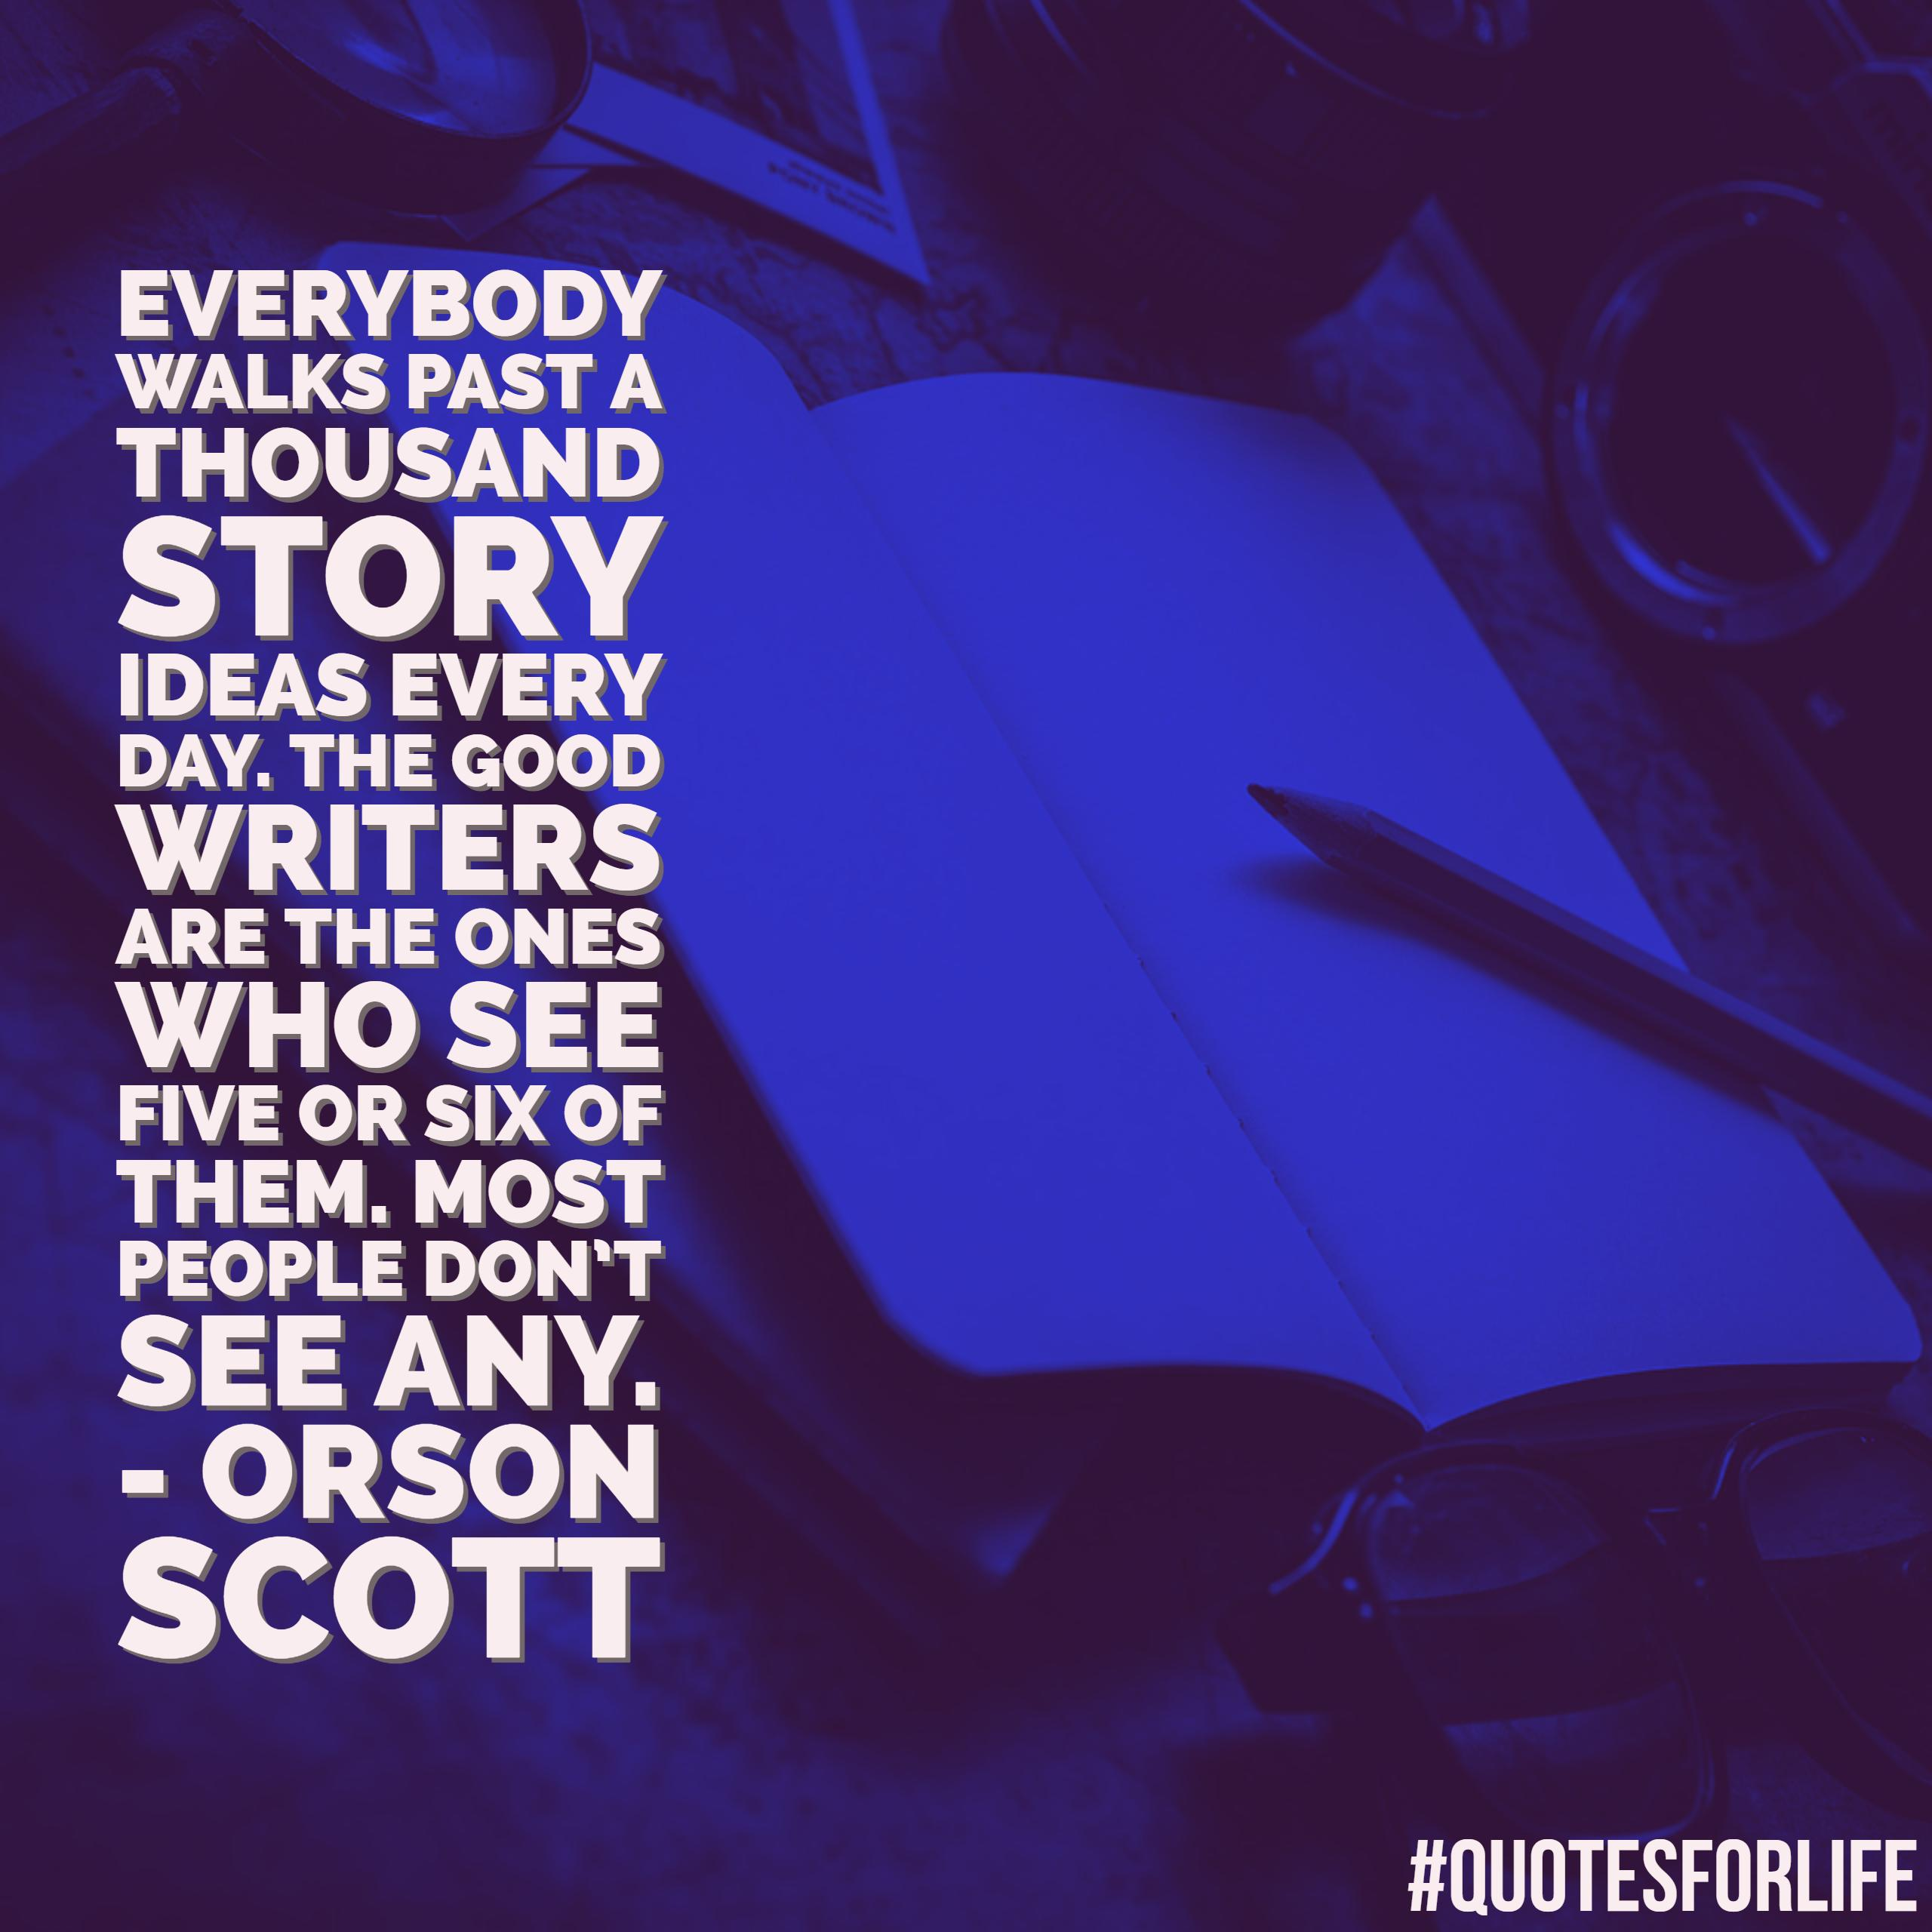 Orson Scott